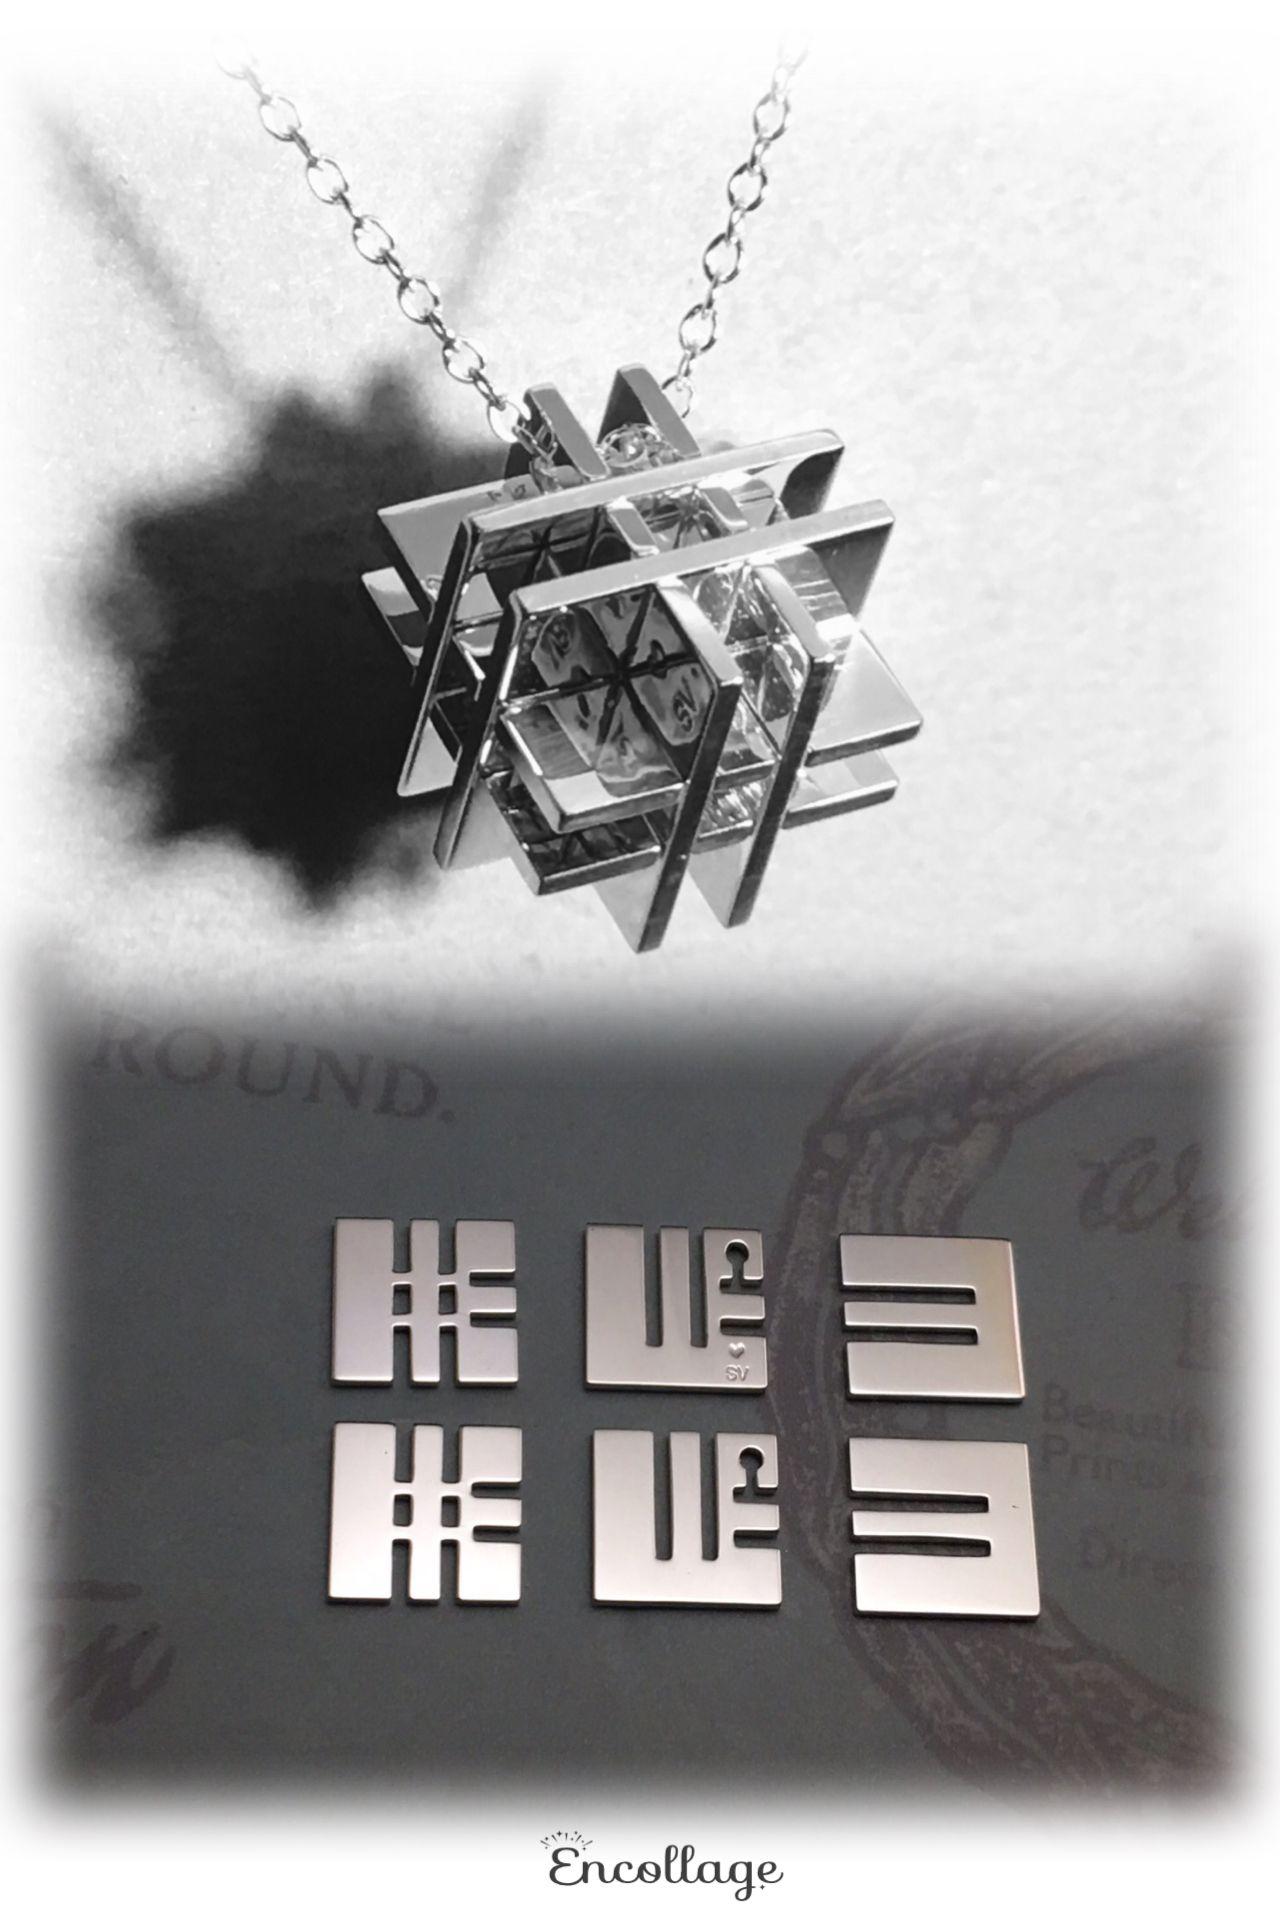 Puzzle W Cube Pendant Silver950 와이어 쥬얼리 쥬얼리 고리